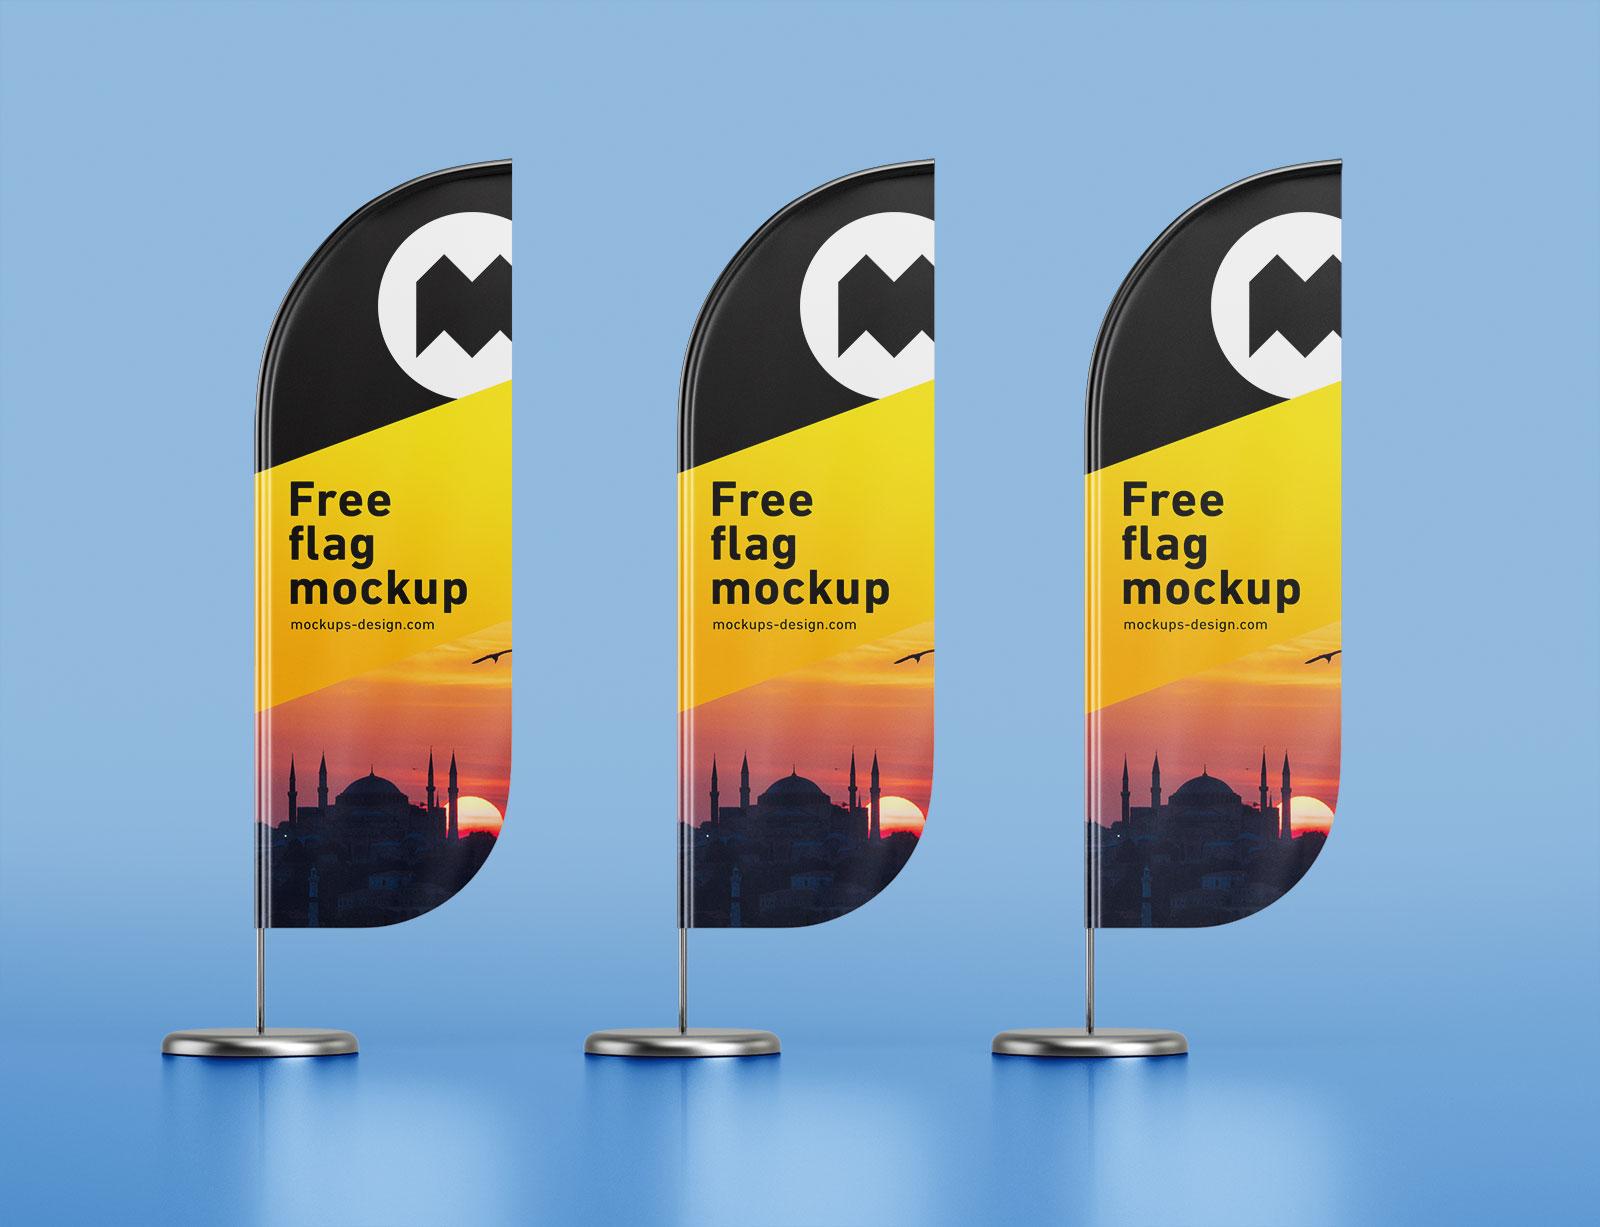 Free-Promotional-Winder-Feather-Flag-Mockup-PSD-Set